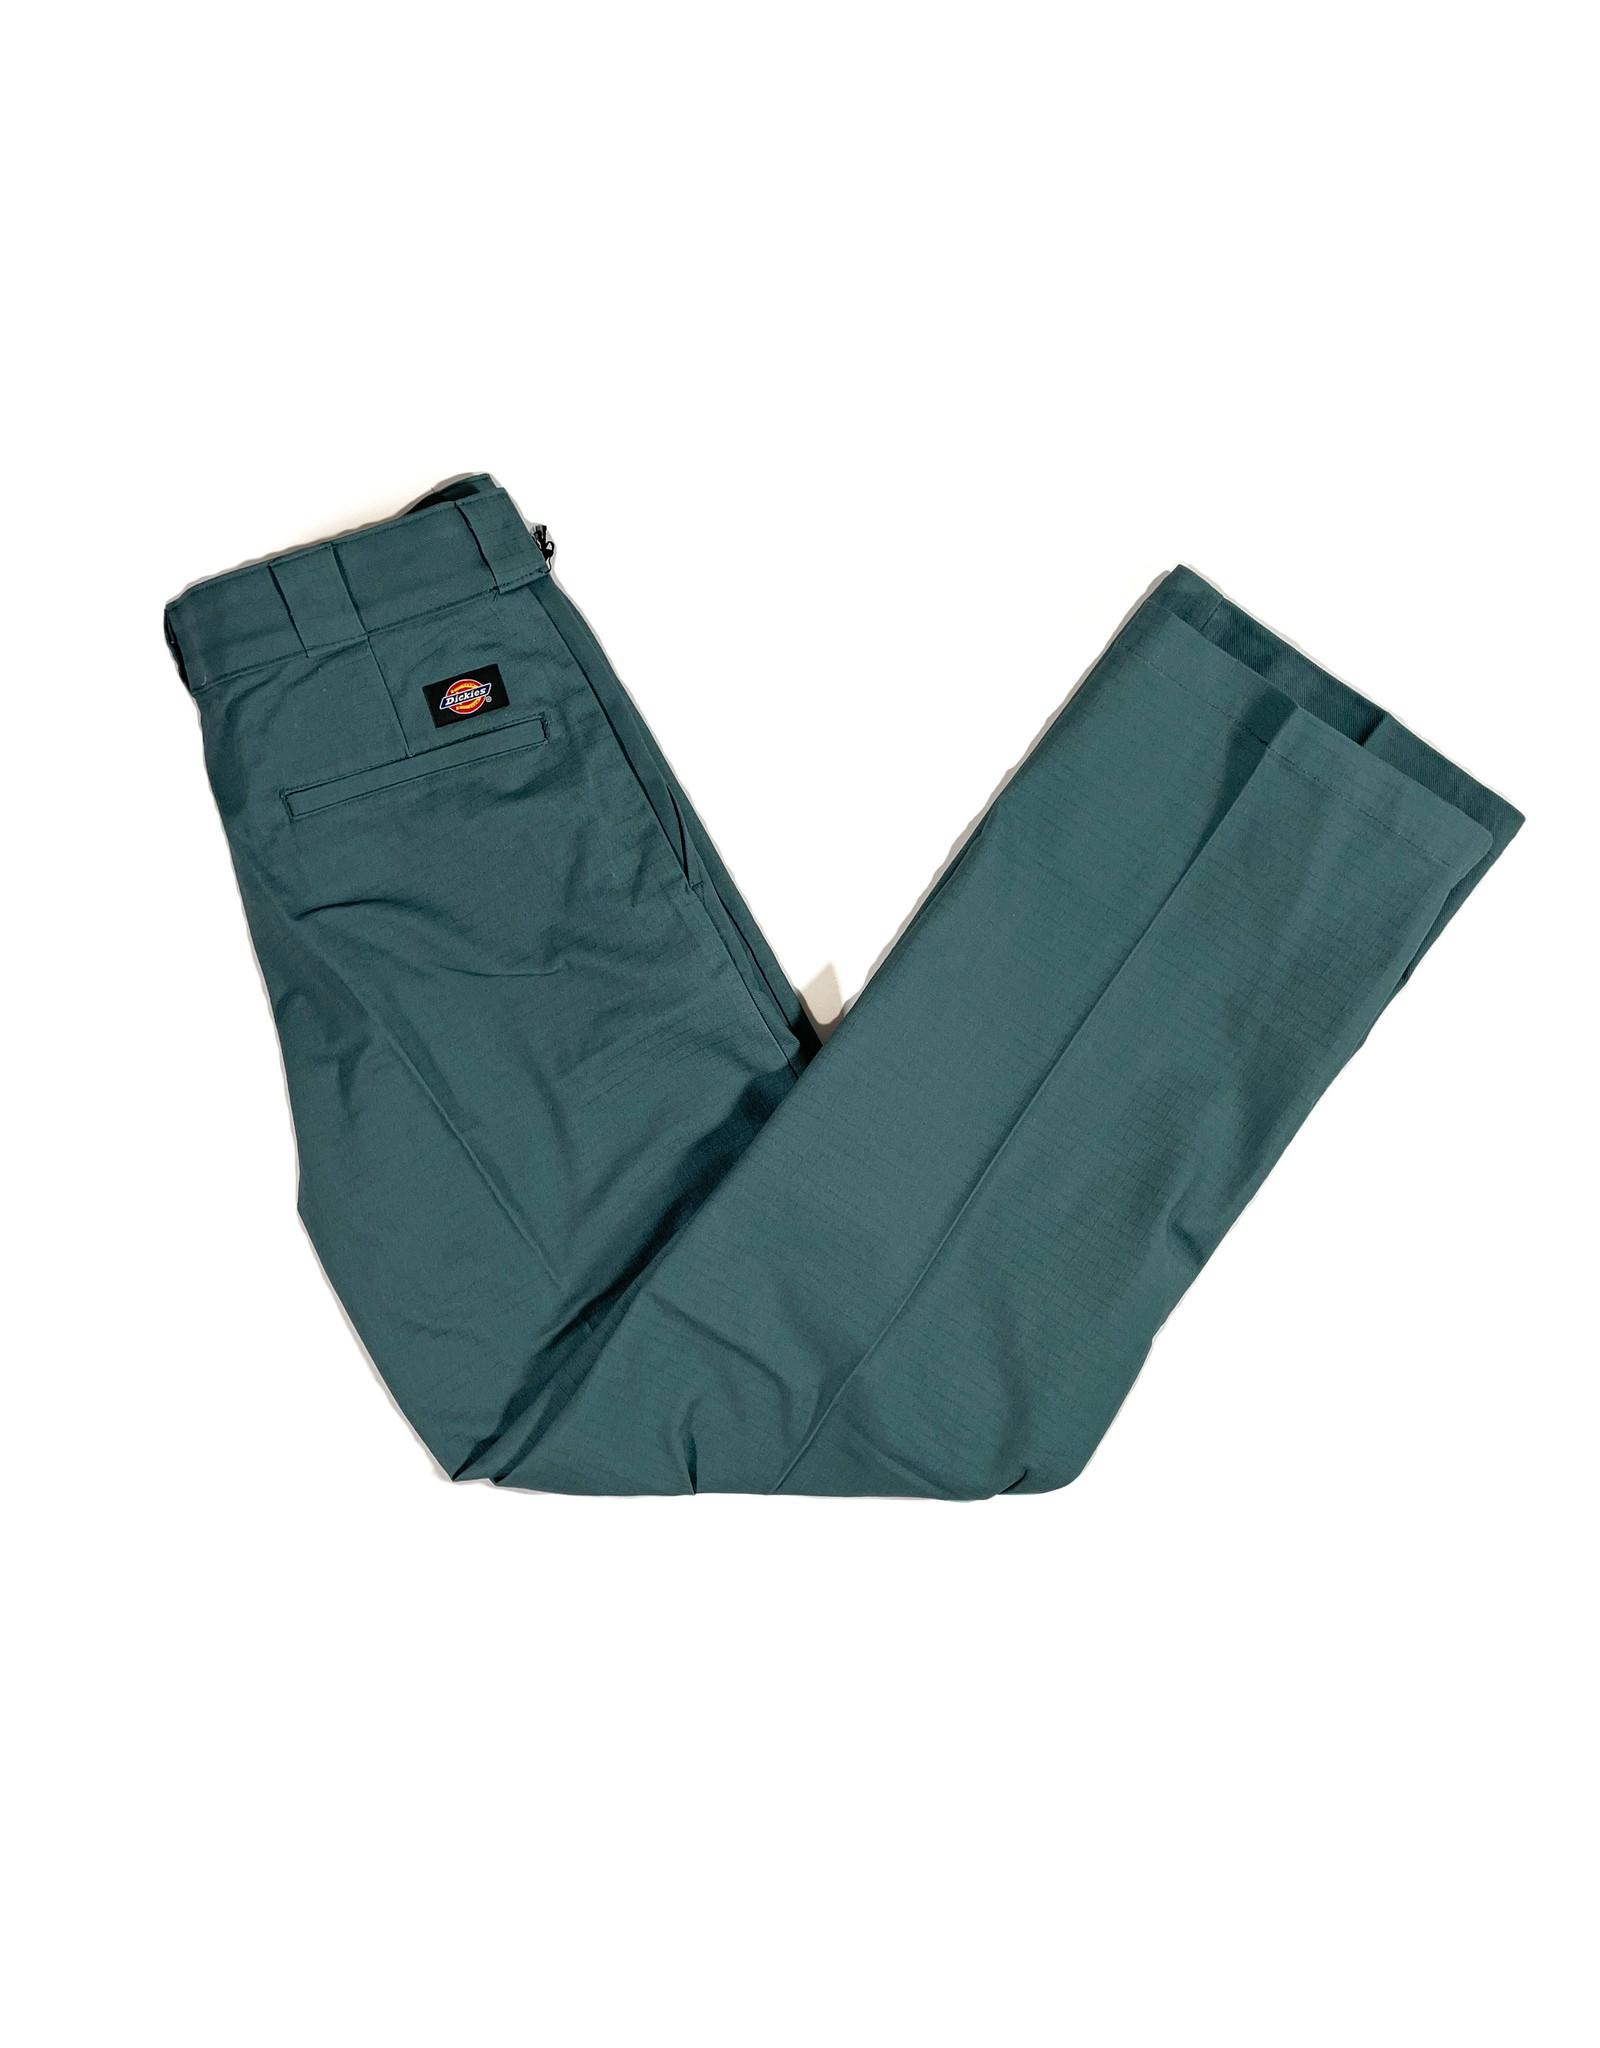 DICKIES DICKIES SLIM TAPER TWILL PANTS - LINCOLN GREEN